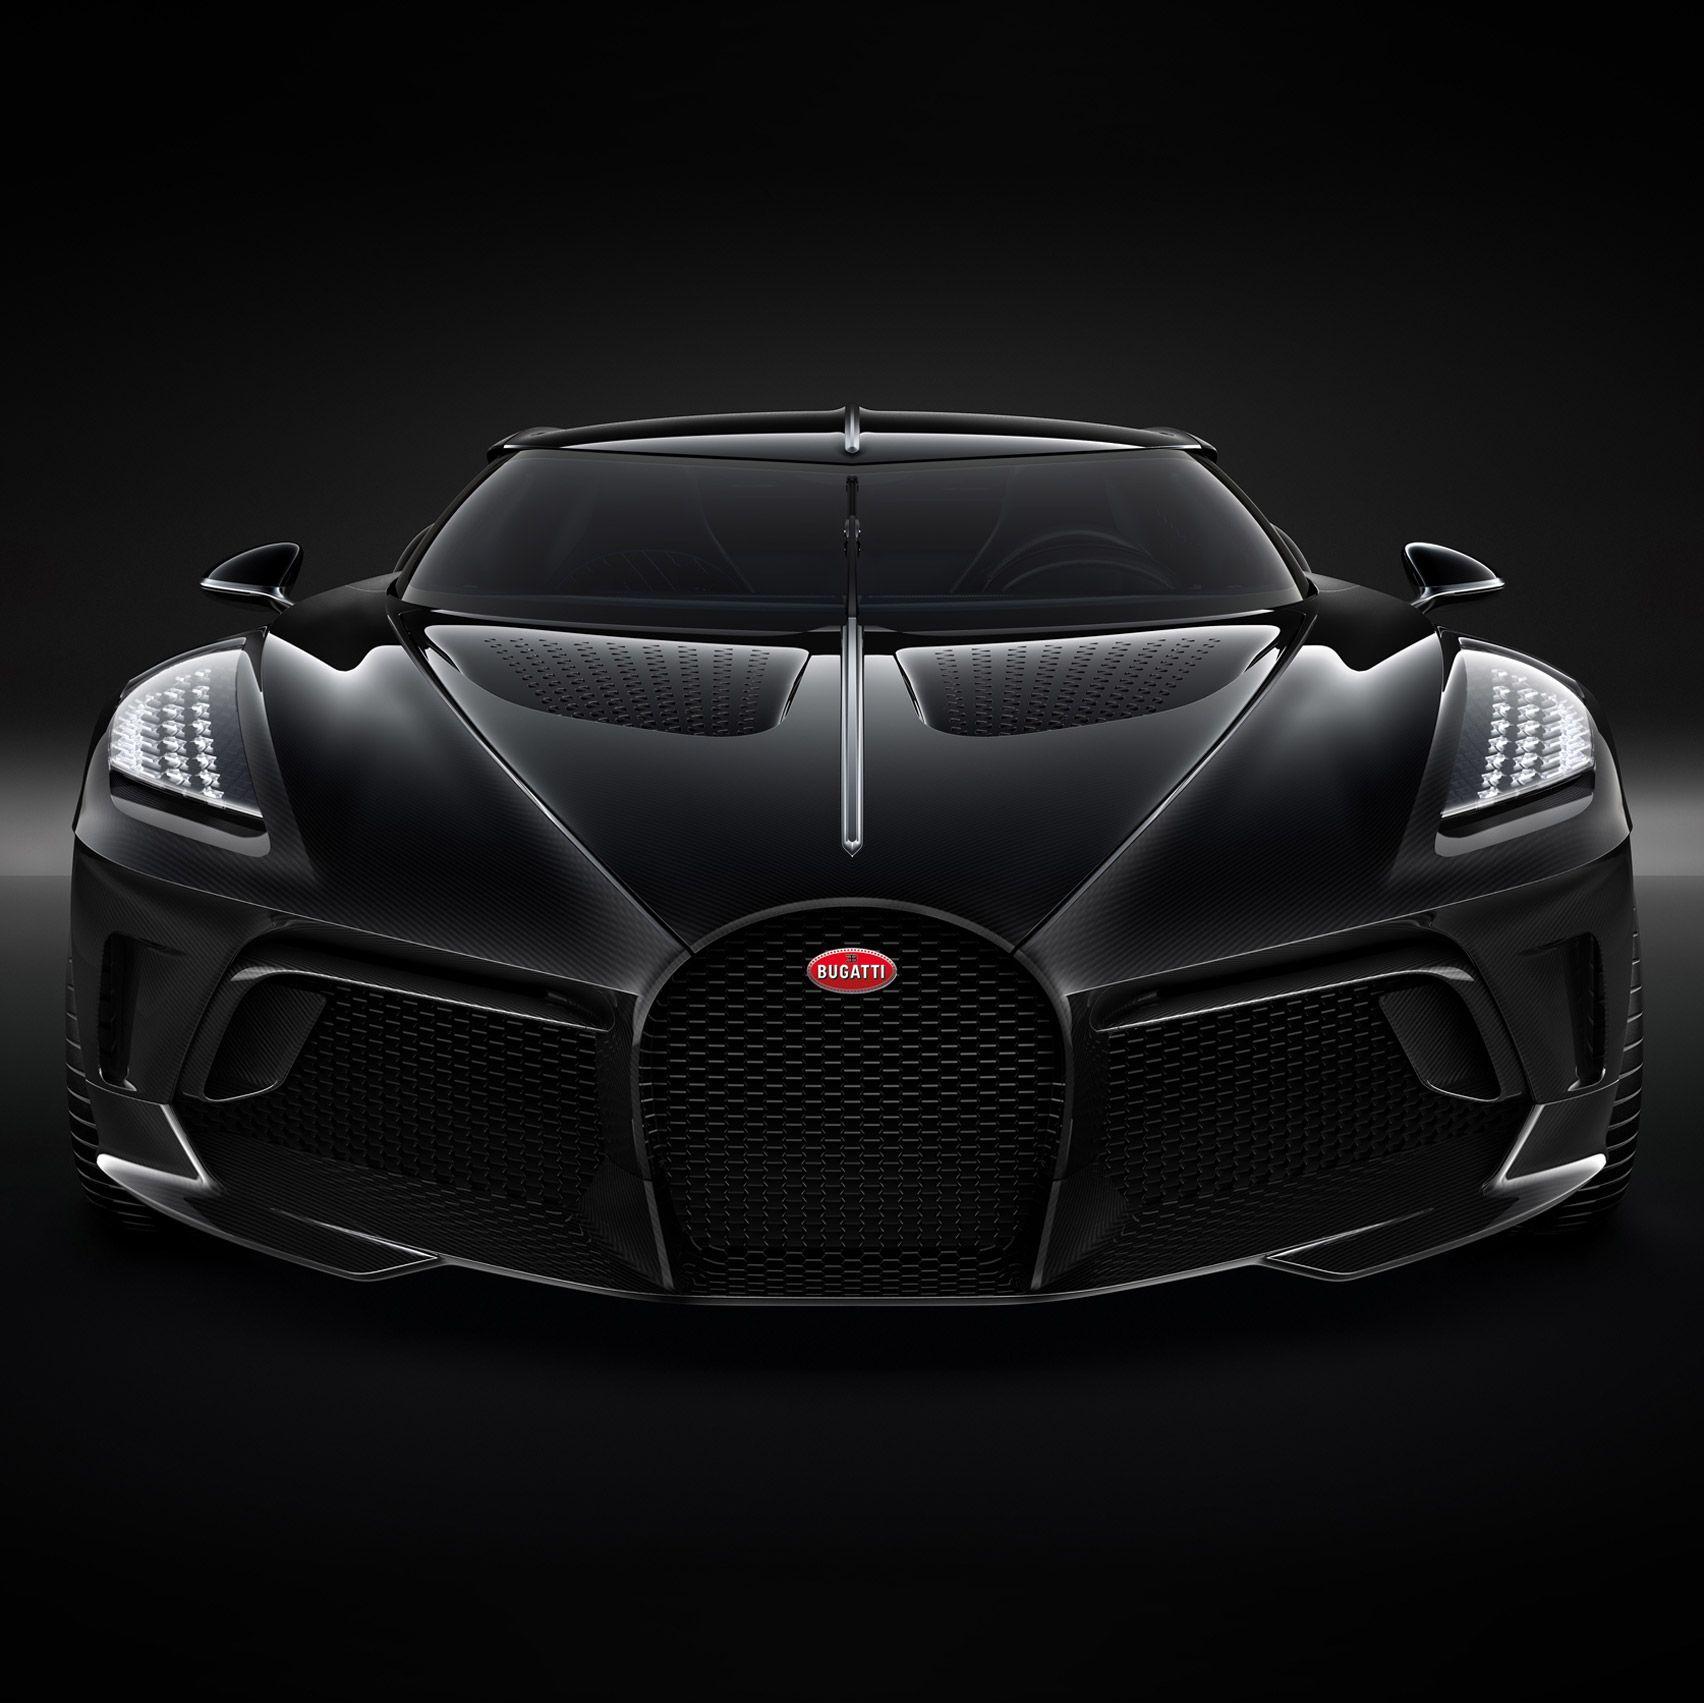 Bugatti S La Voiture Noire Is The World S Most Expensive Car Dr Wong Emporium Of Tings Web Magazine Most Expensive Car Bugatti Cars Black Car